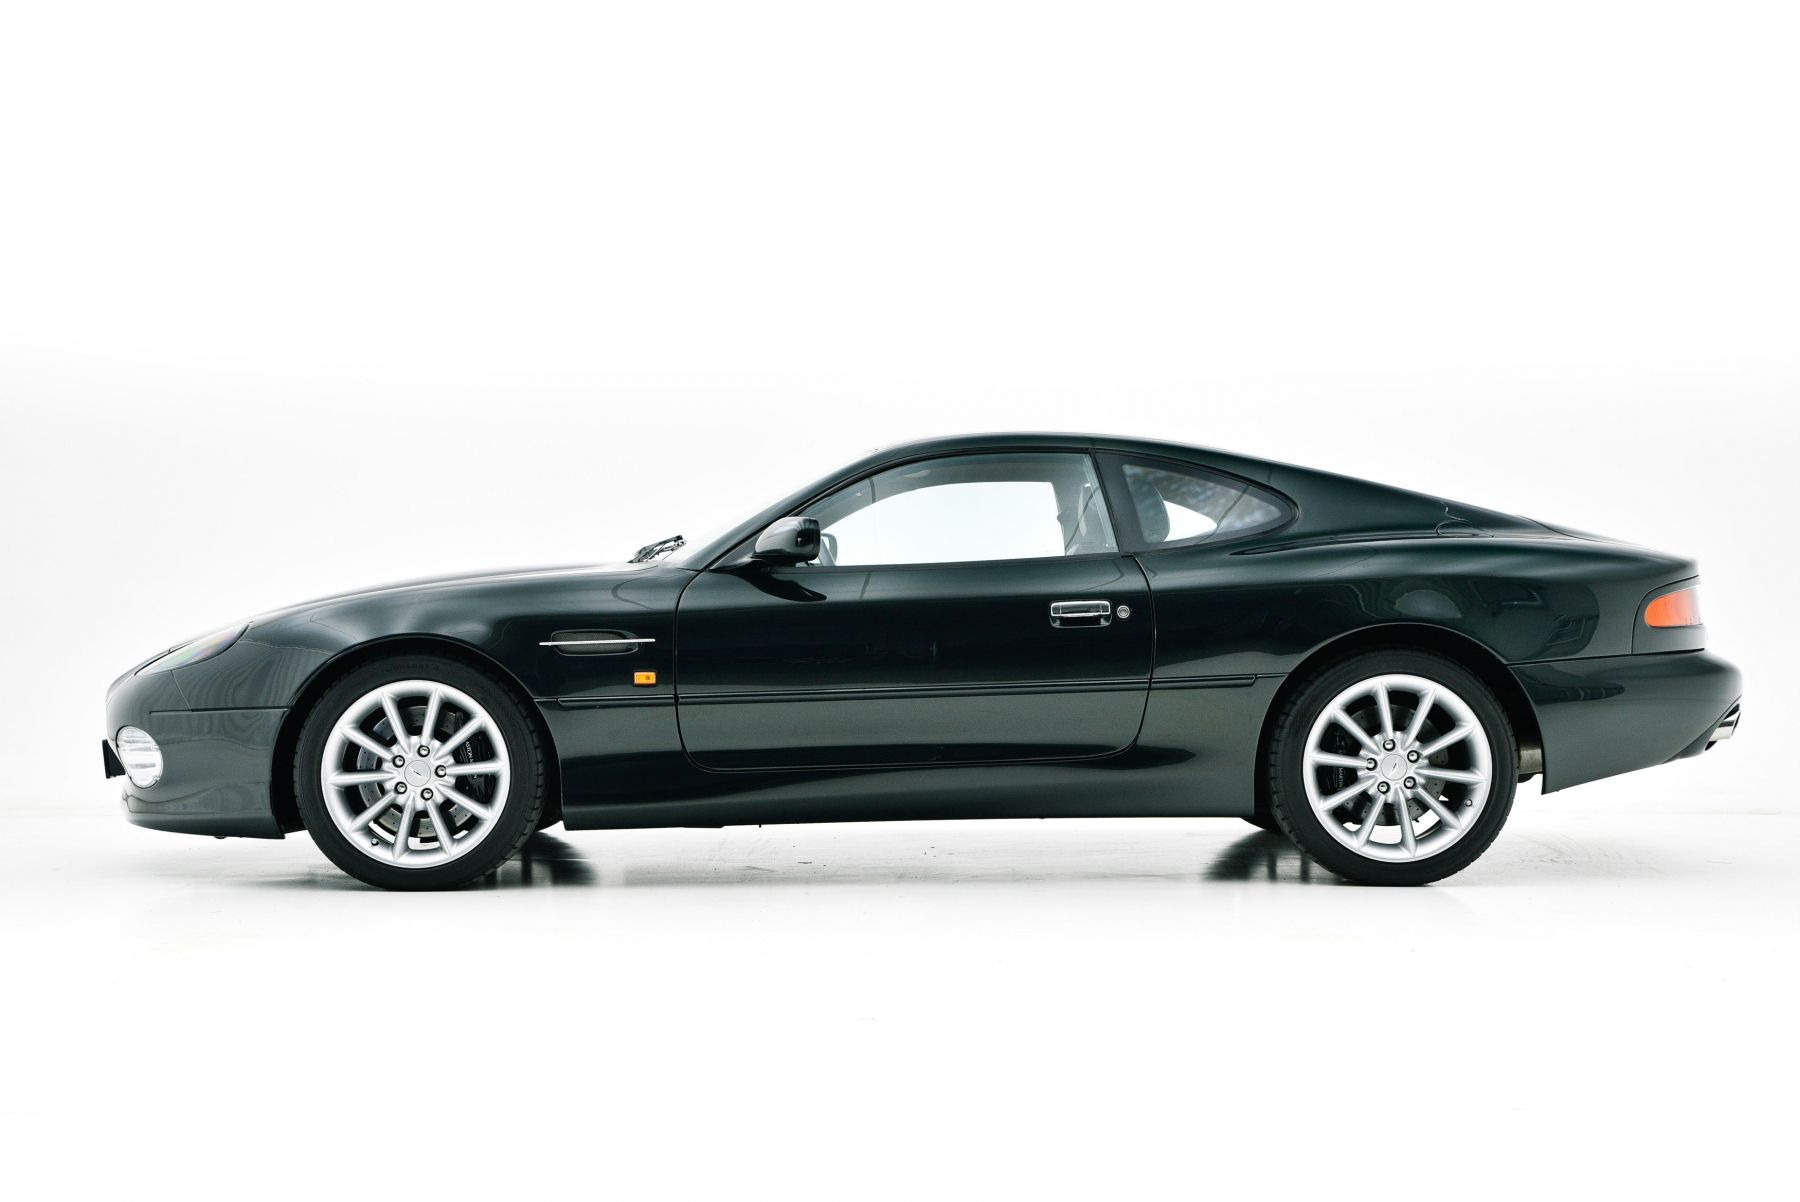 Aston Martin Db7 V12 For Sale Brooks Classics Klassiekers Youngtimers